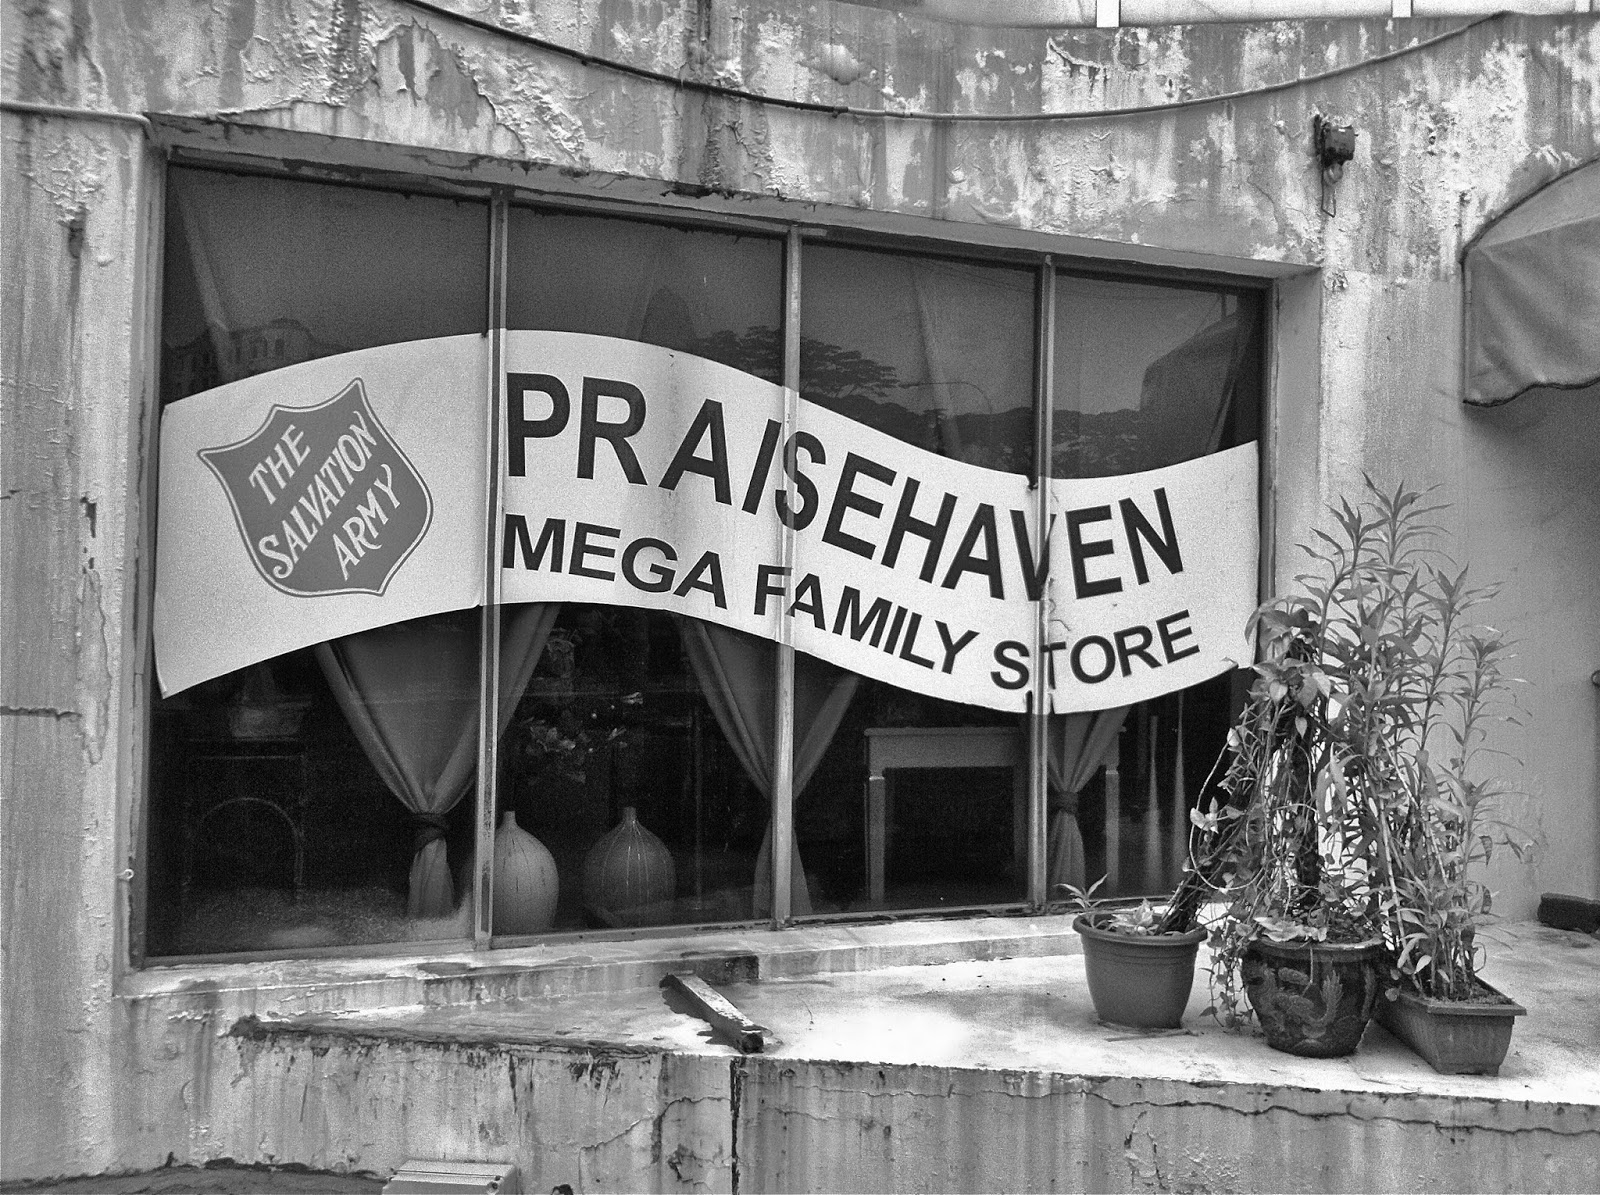 Praiseheaven Family Megastore